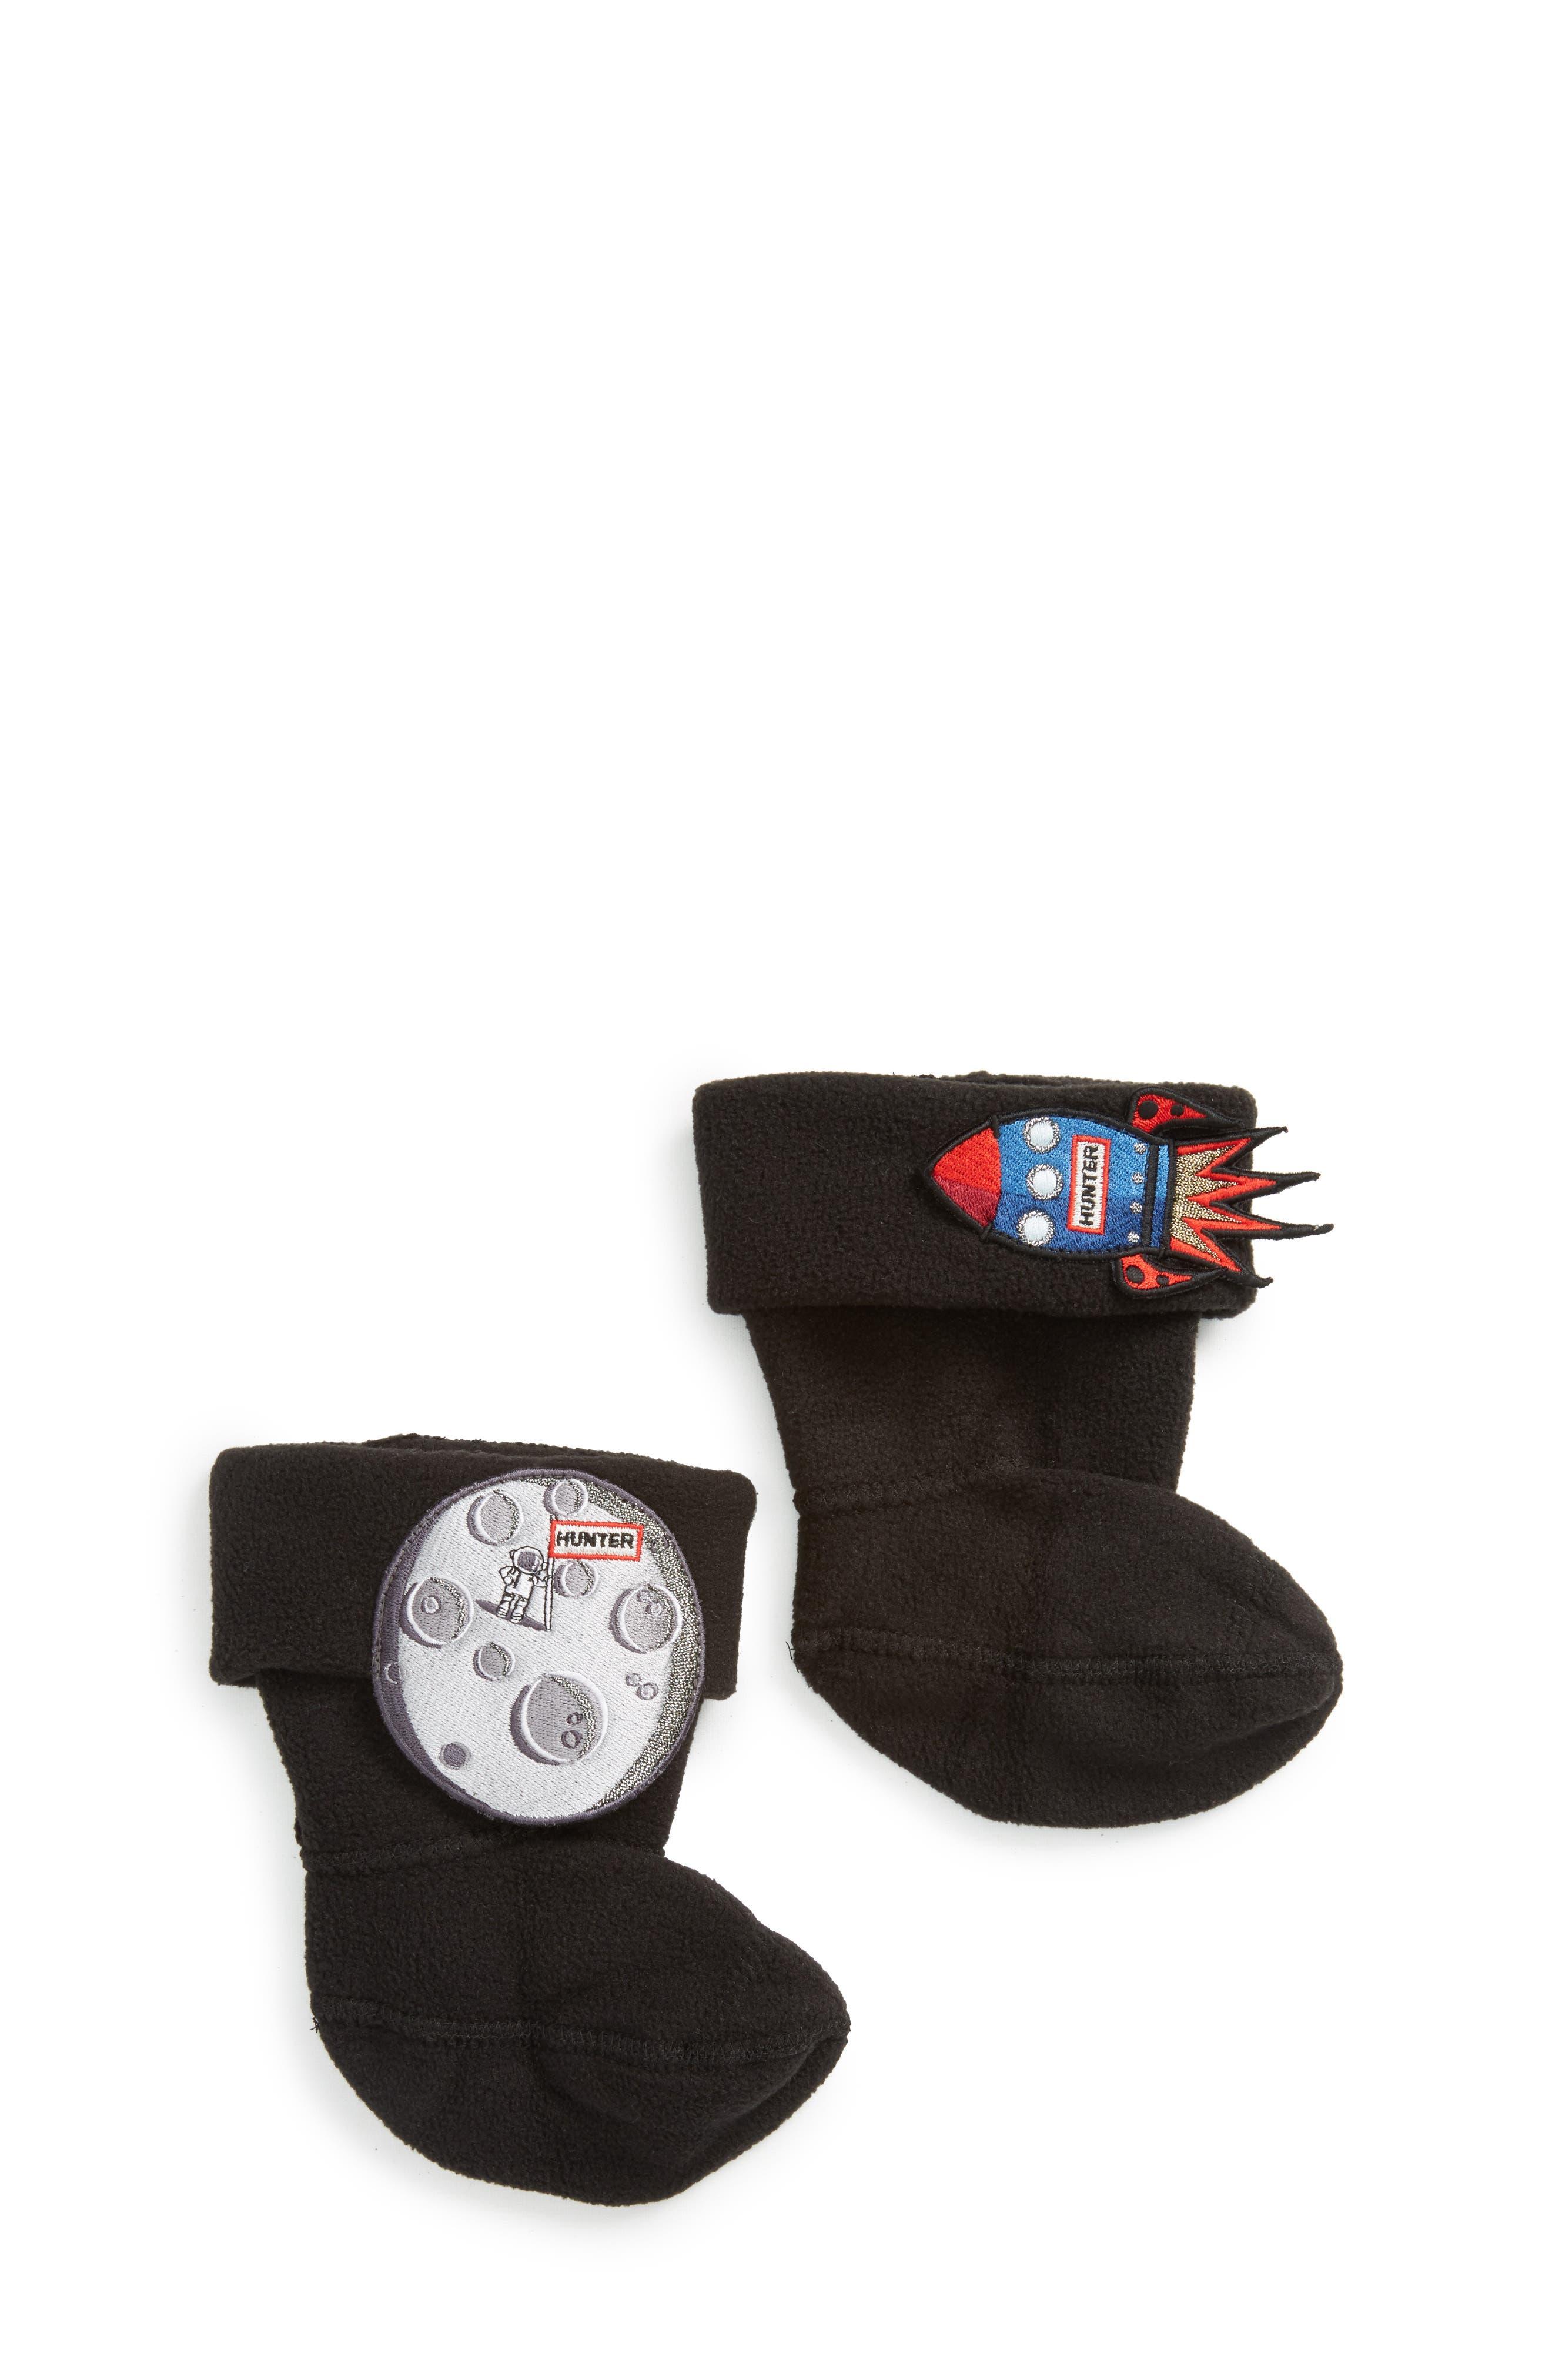 Spaceship/Moon Boot Socks,                         Main,                         color, 019